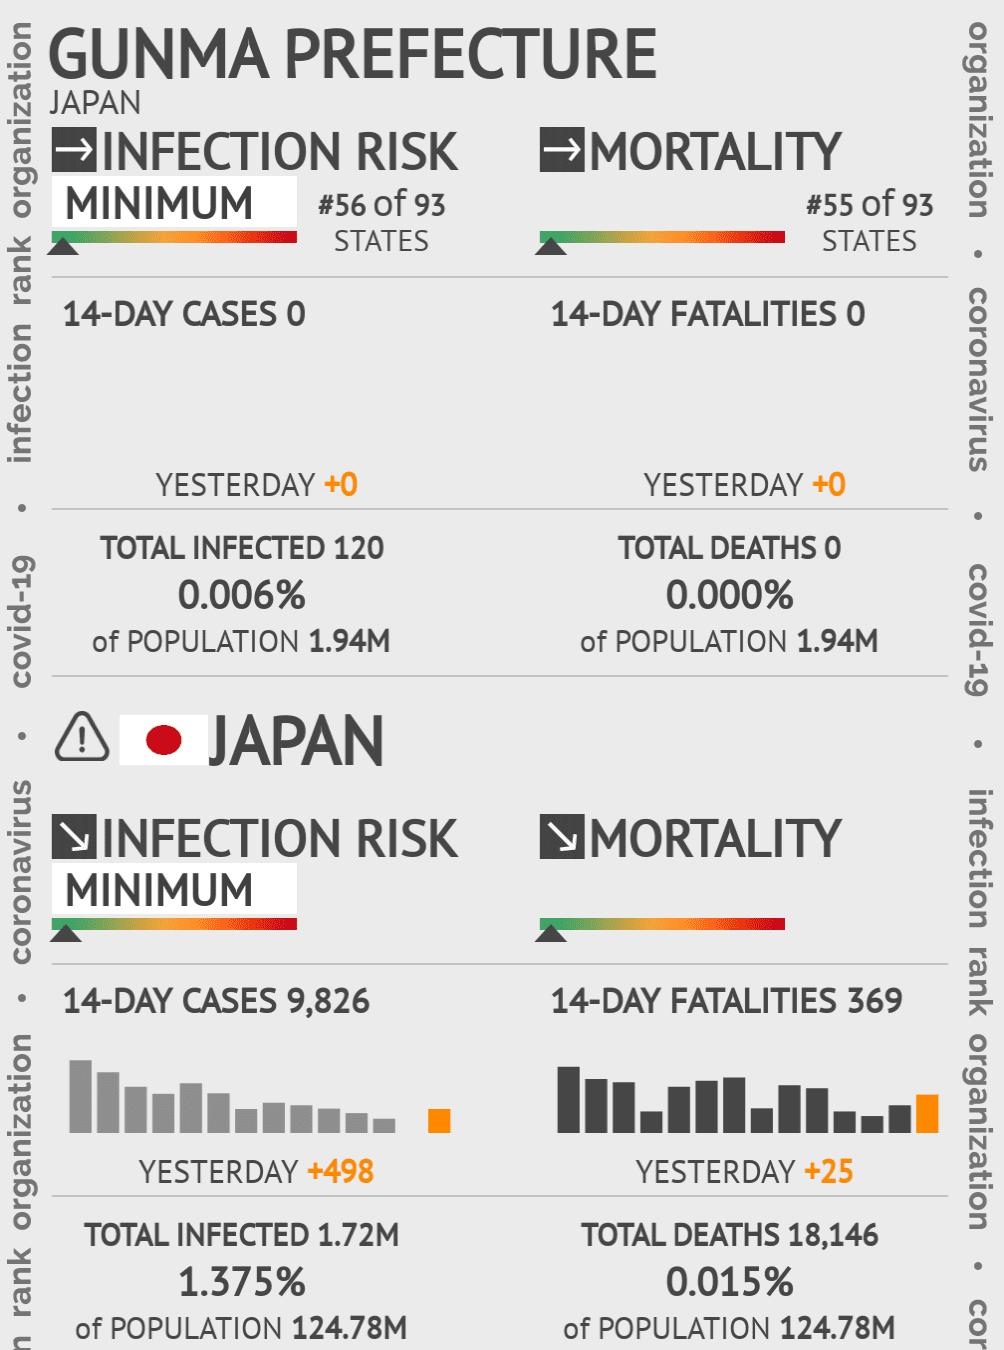 Gunma Prefecture Coronavirus Covid-19 Risk of Infection on May 14, 2020